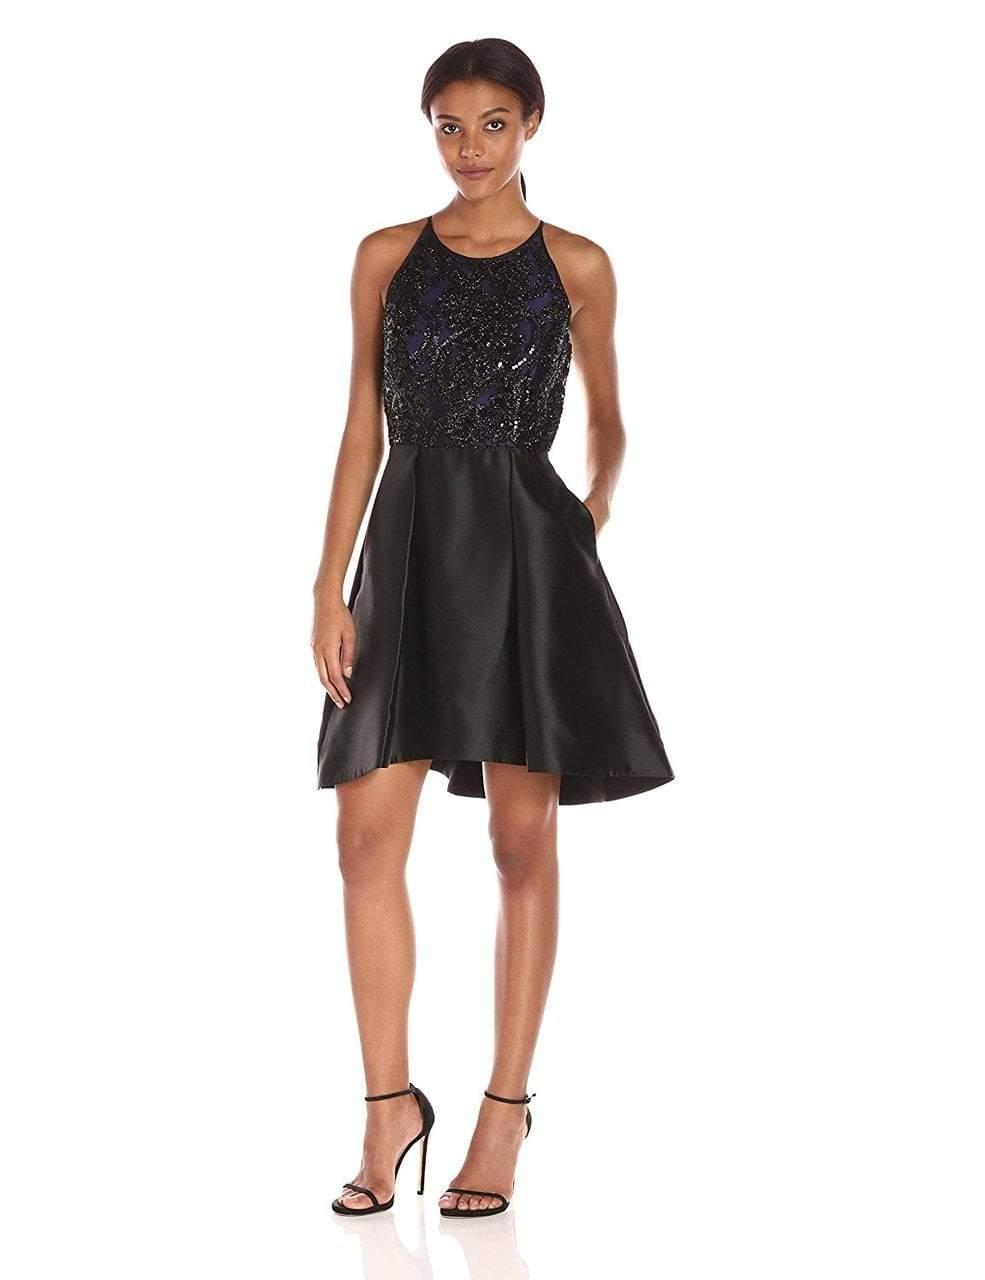 Taylor - Halter Neck A-Line Dress 8419M